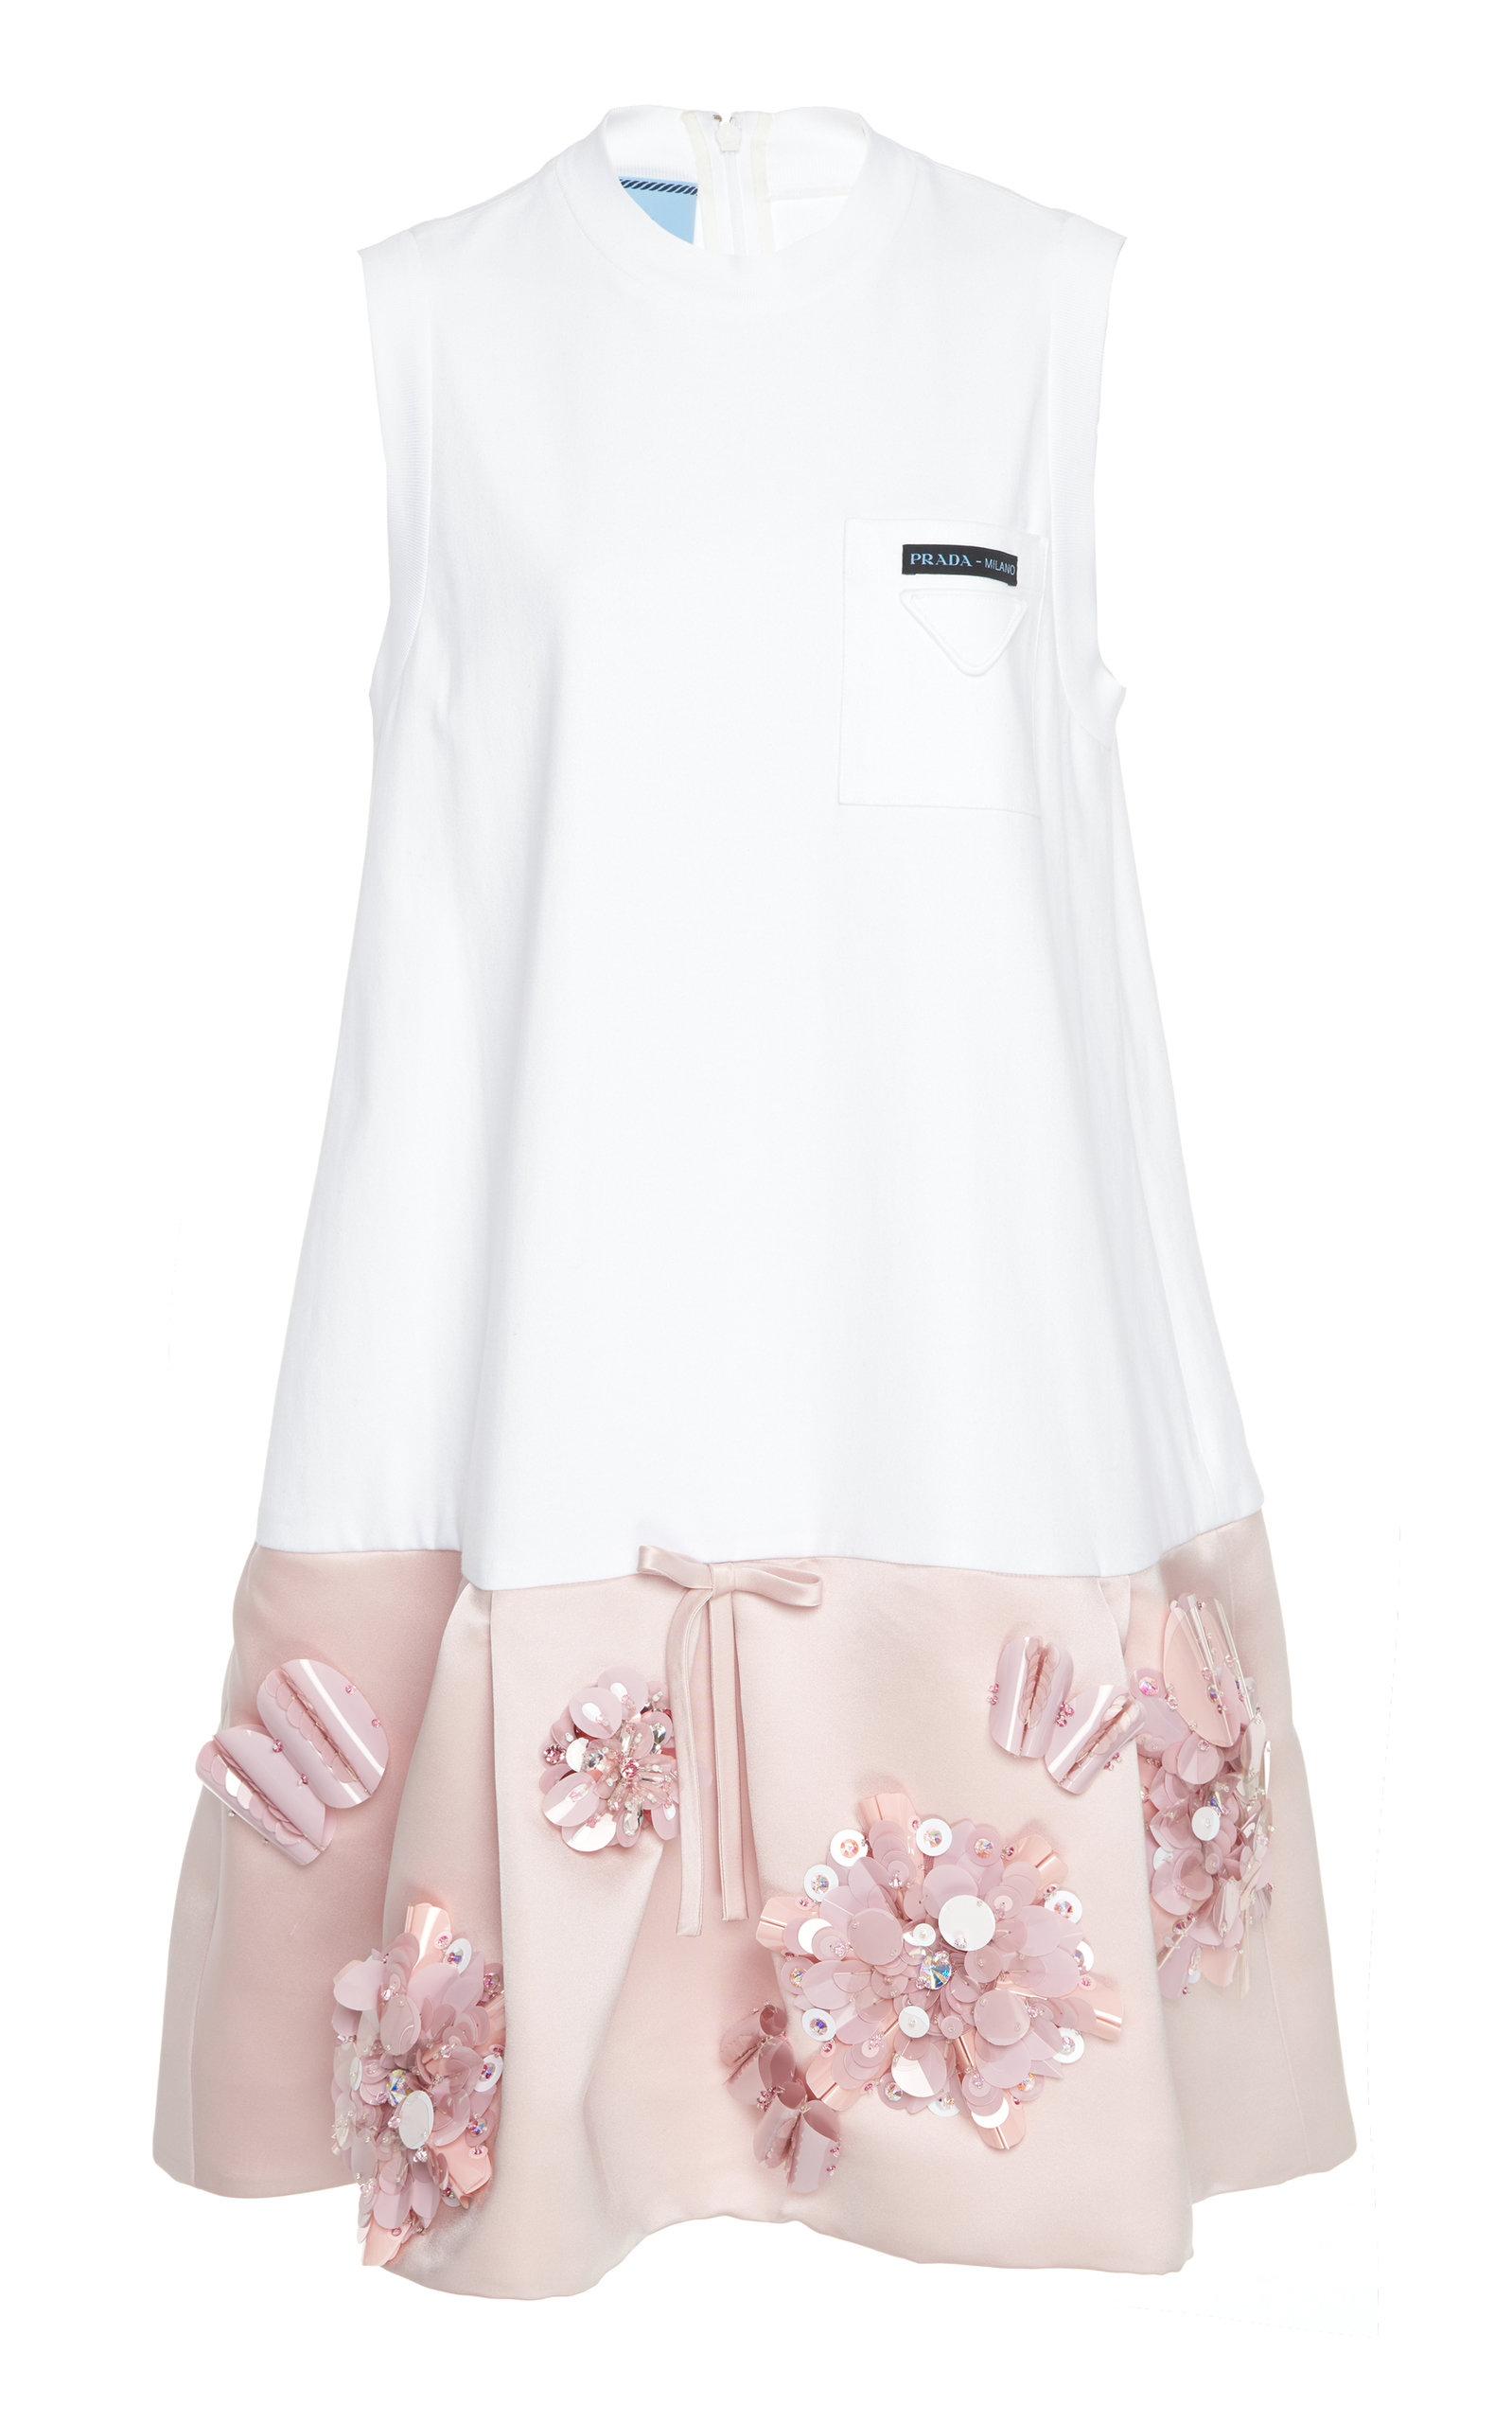 Buy Prada Embellished Satin-Paneled Jersey Mini Dress online, shop Prada at the best price